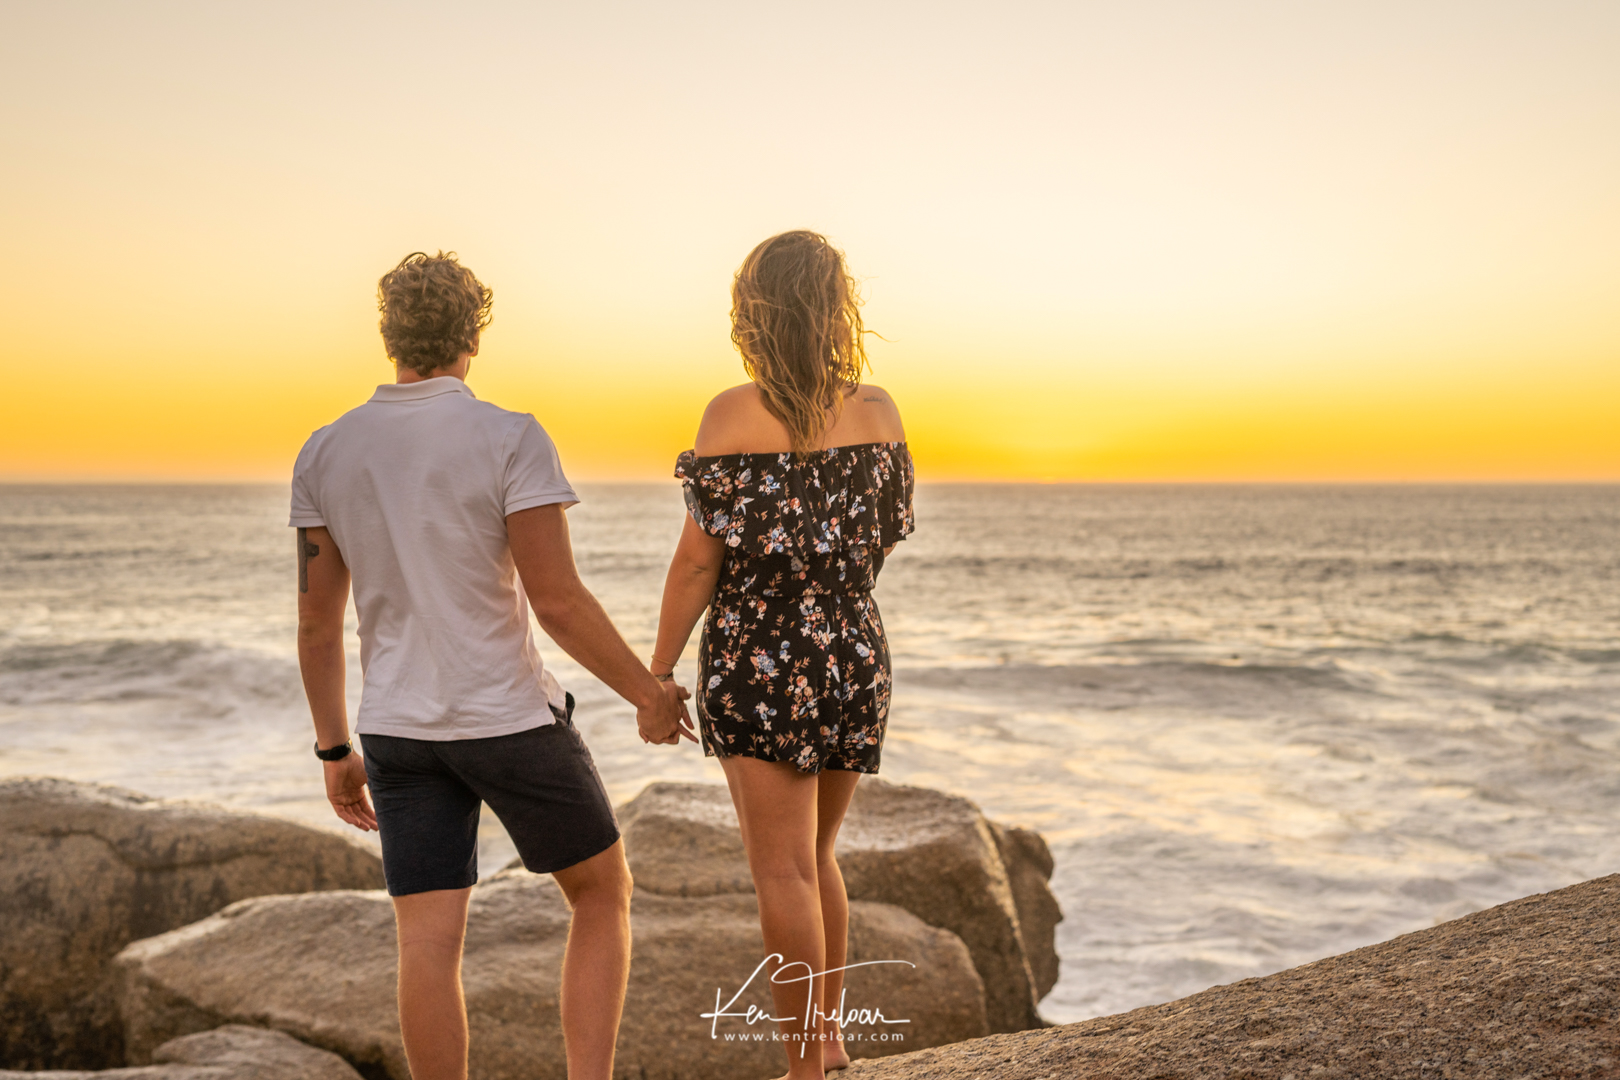 Ken Treloar Photography - _Llandudno_Sunset Couples Session 2019-16.jpg